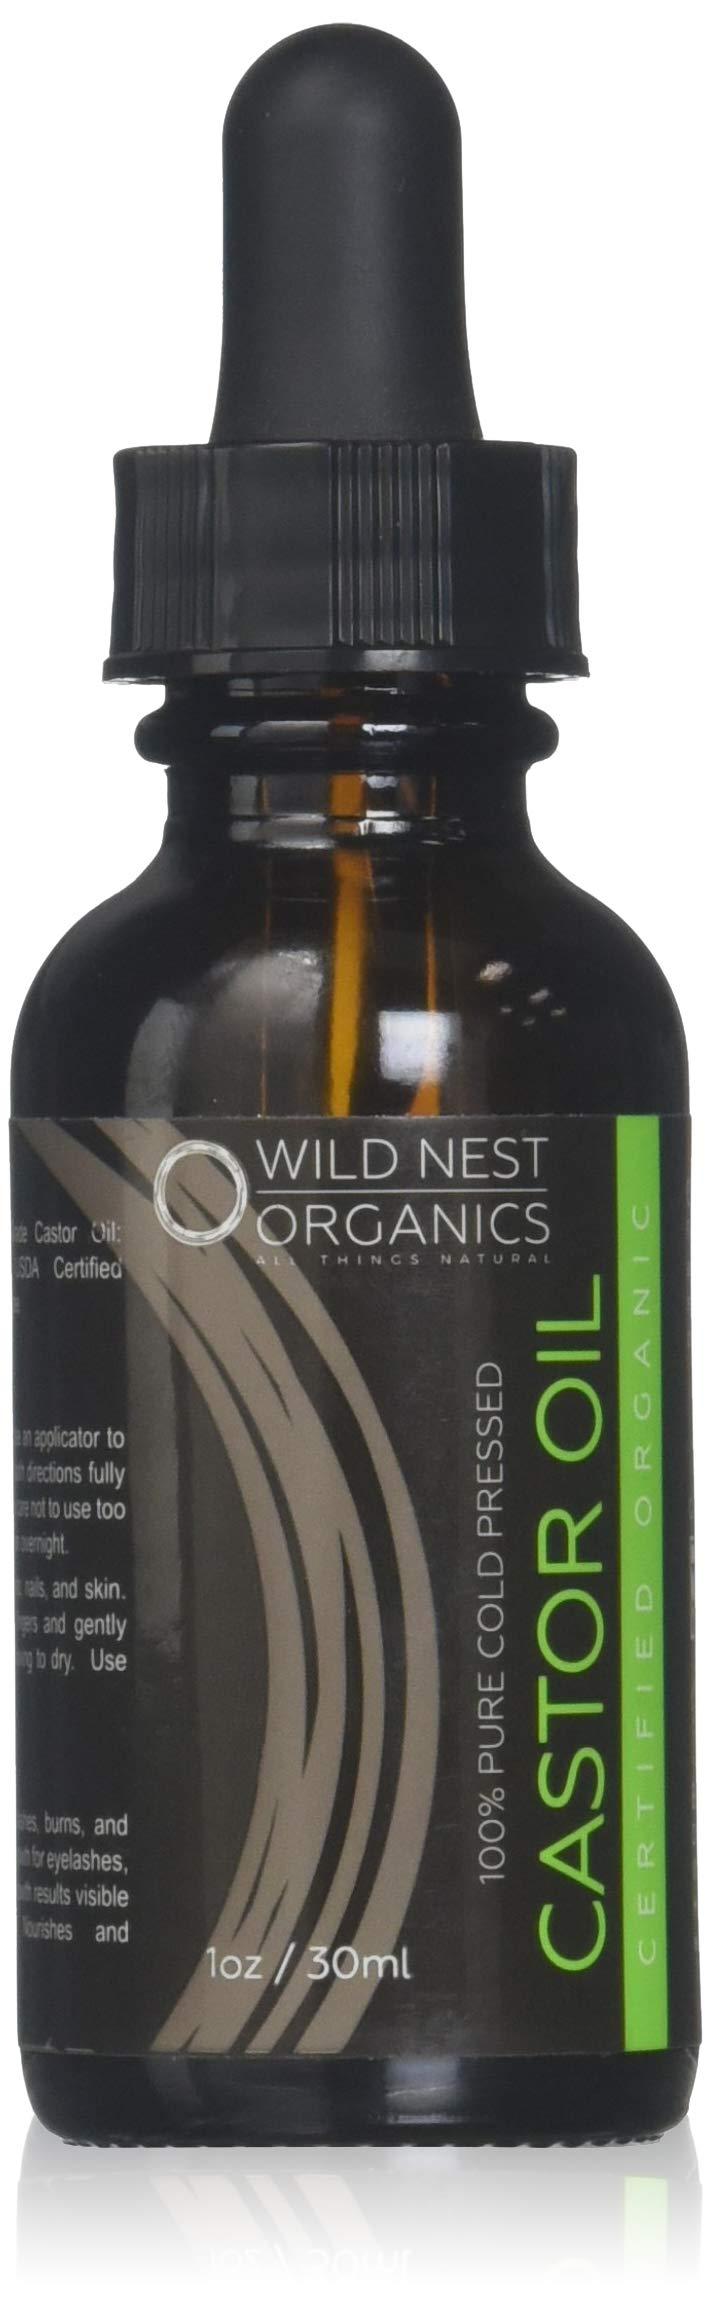 Organic Castor Oil USDA Certified Hair Regrowth Tonic Energizing Scalp Serum + eBook - Boost New